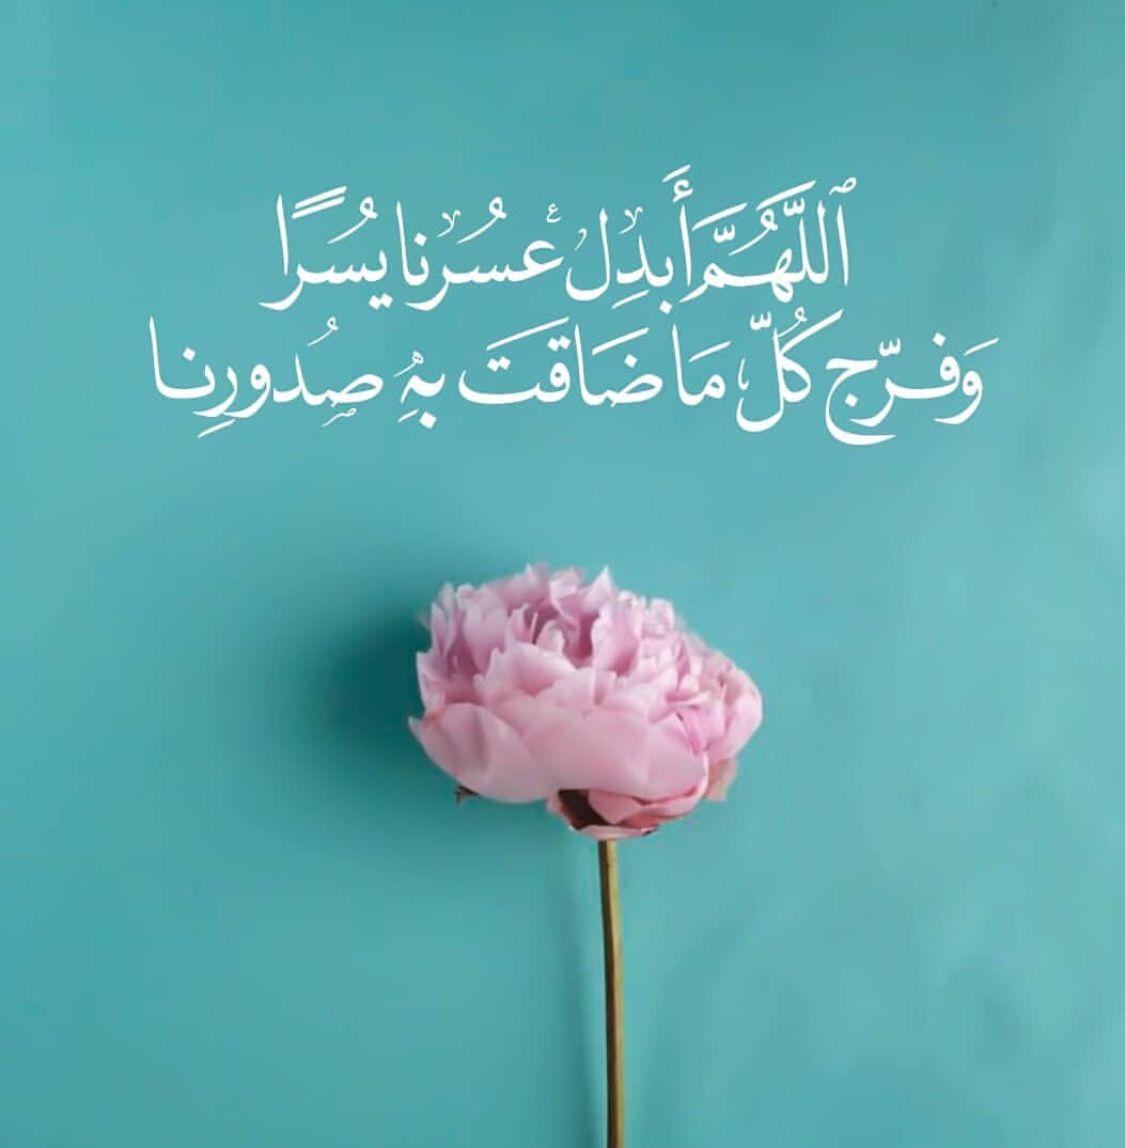 اللهم آمين يا رب Funny Arabic Quotes Islamic Quotes Wallpaper Quran Wallpaper